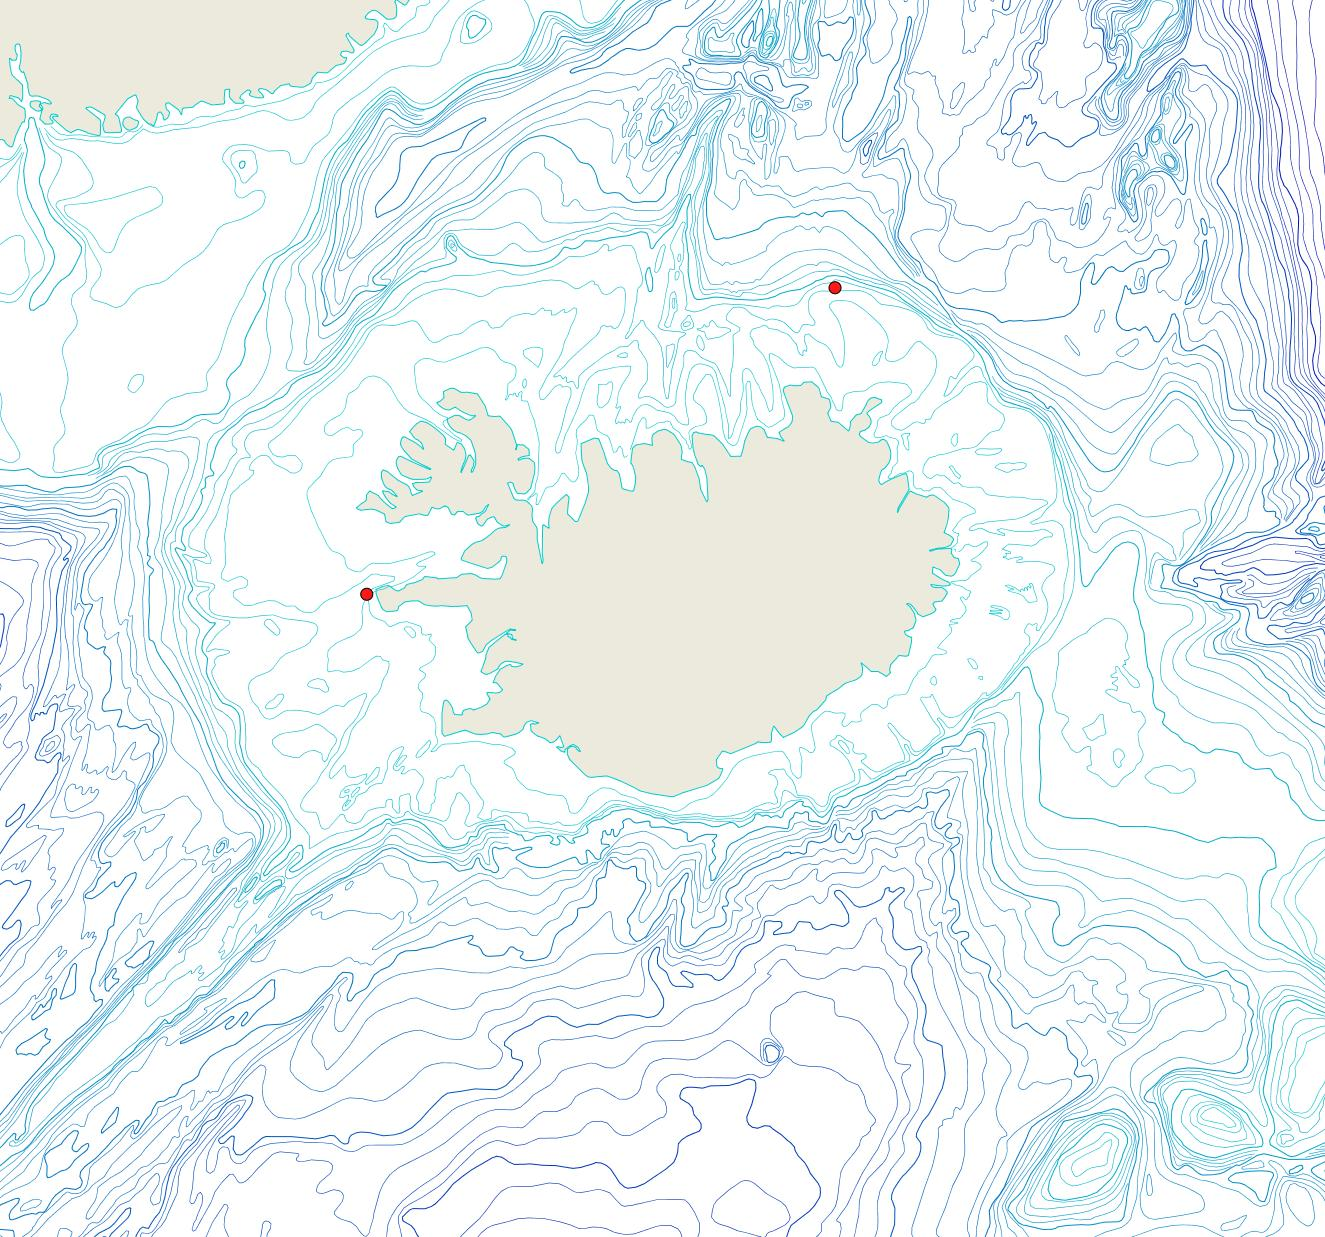 Útbreiðsla Posterula sarsii(Bioice samples, red dots)